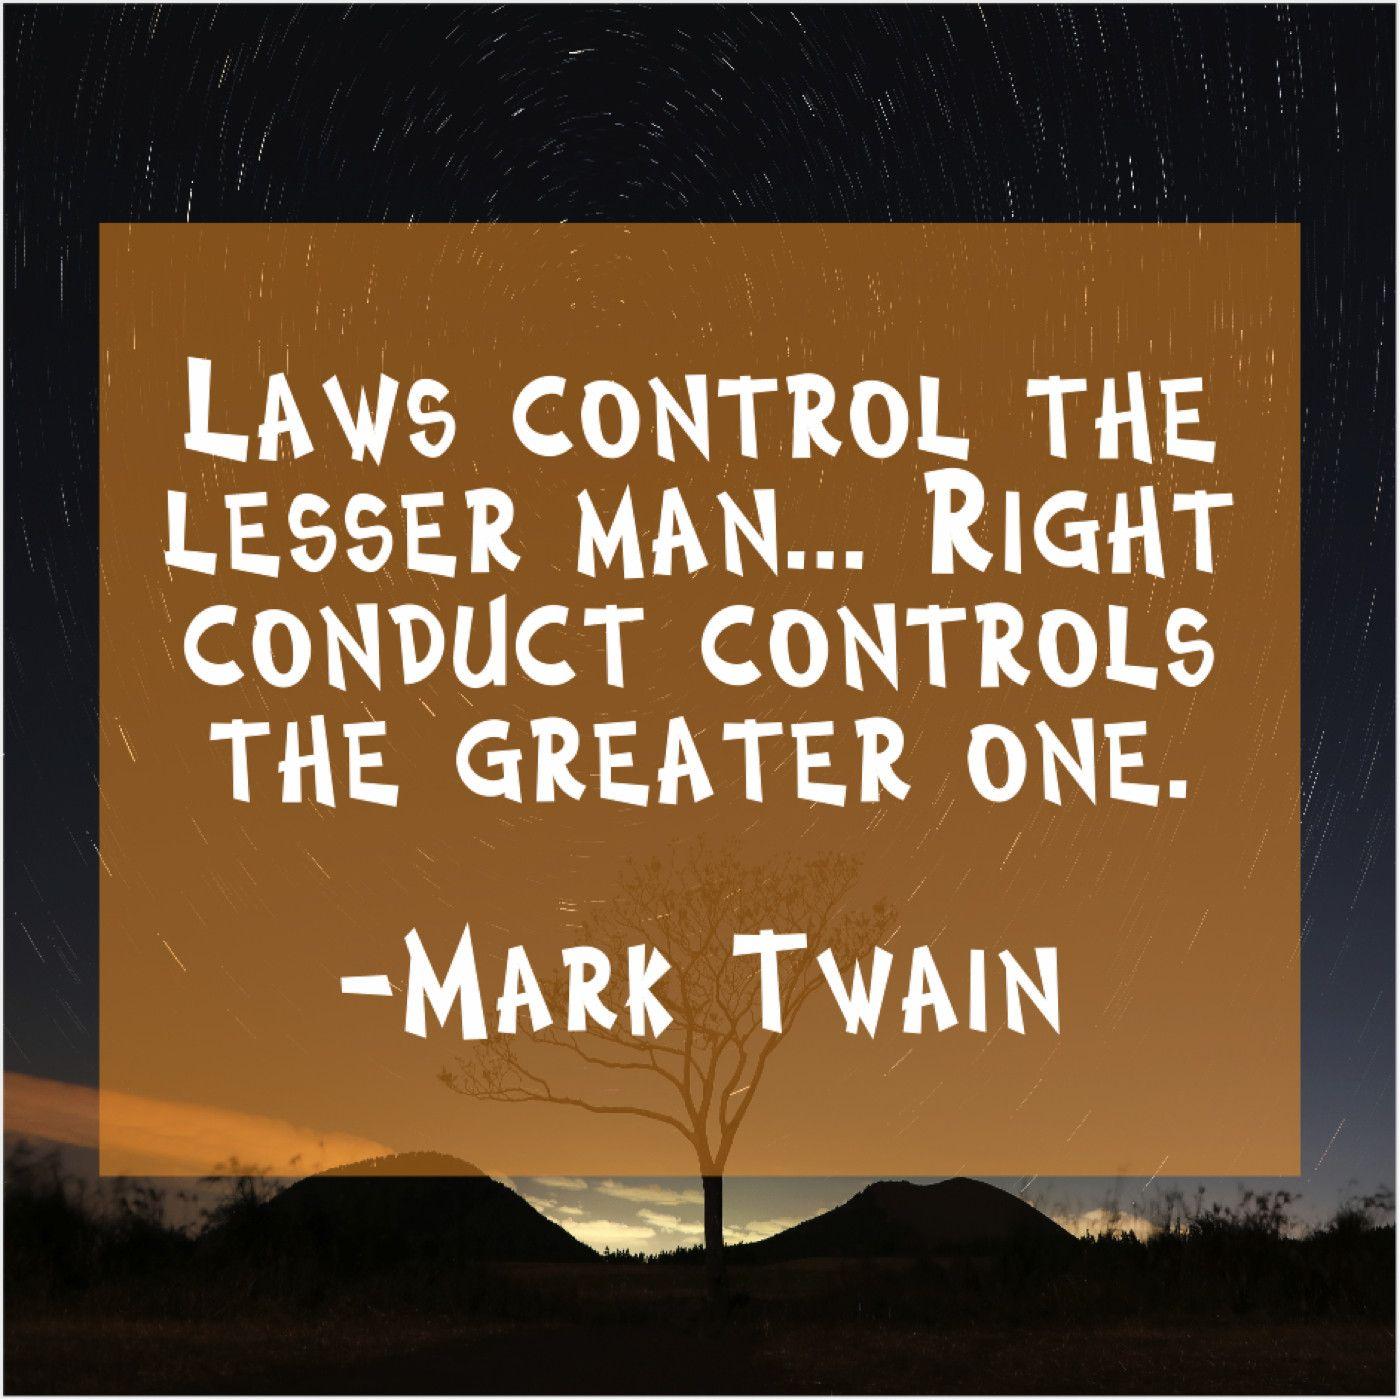 Mark Twain  Laws control the lesser man #marktwain